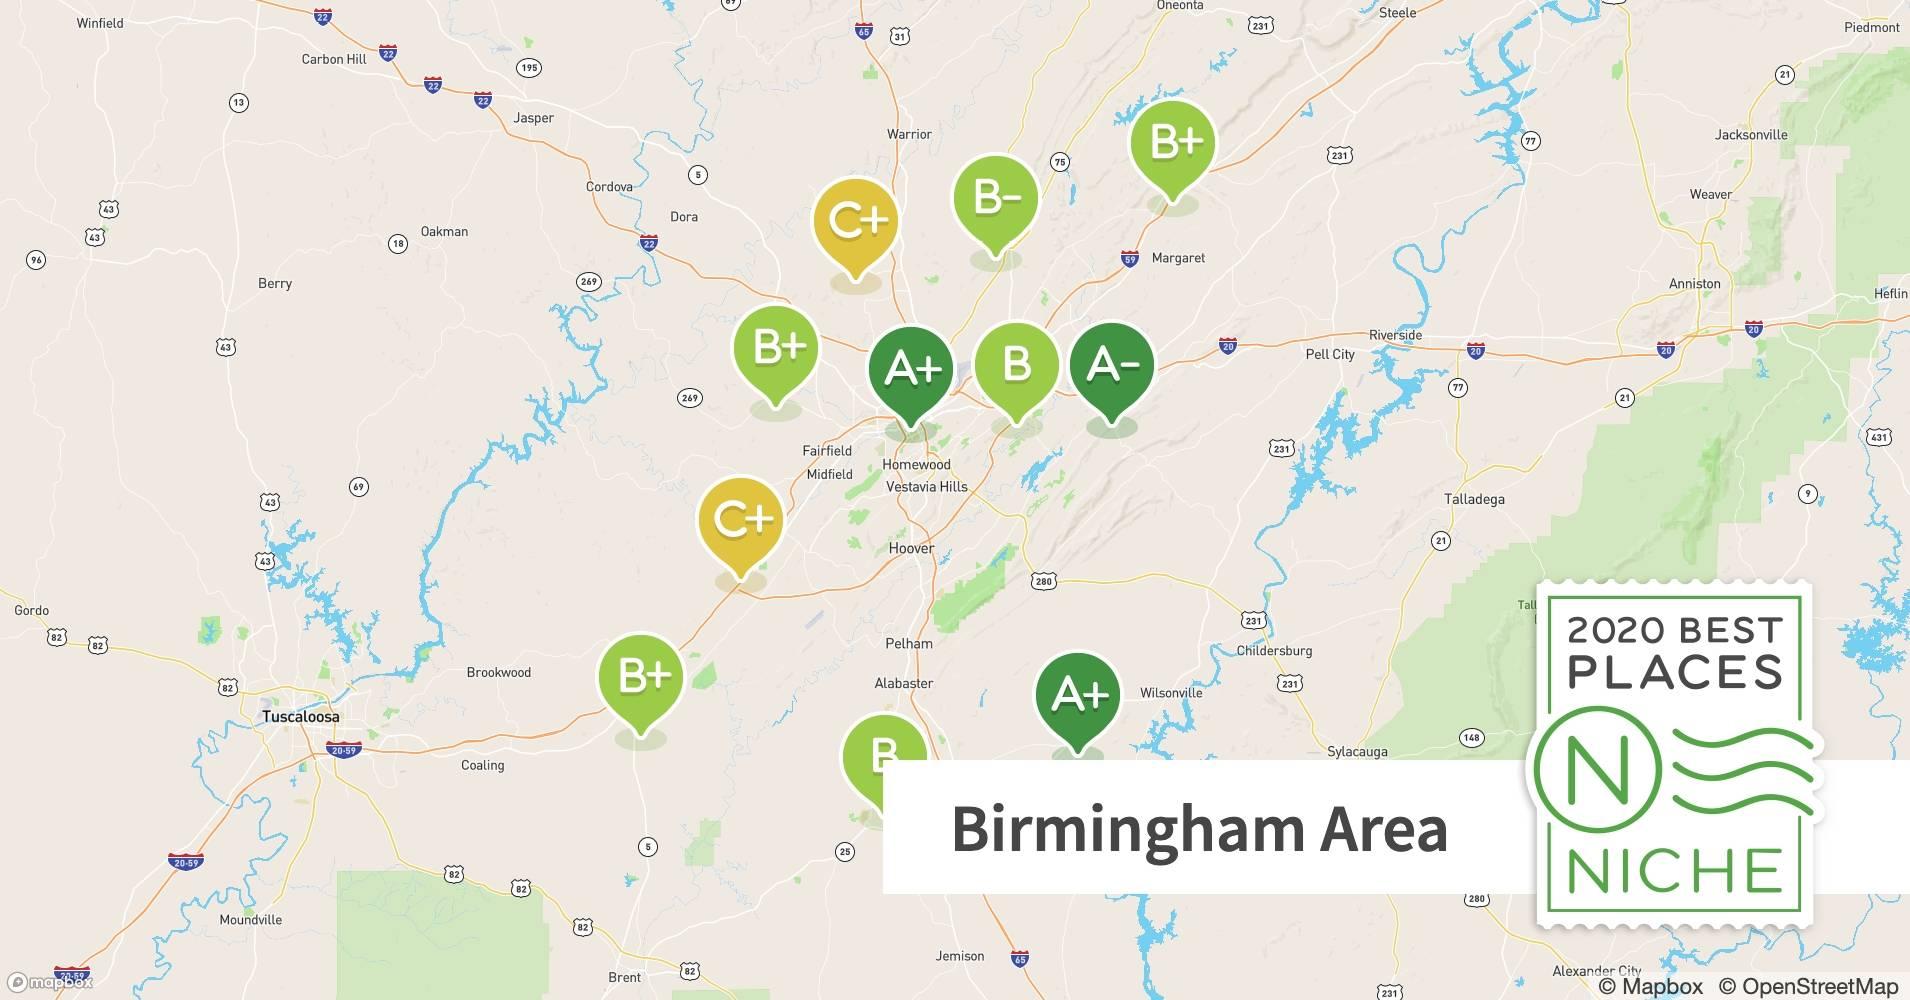 2020 Best Birmingham Area Suburbs To Live Niche